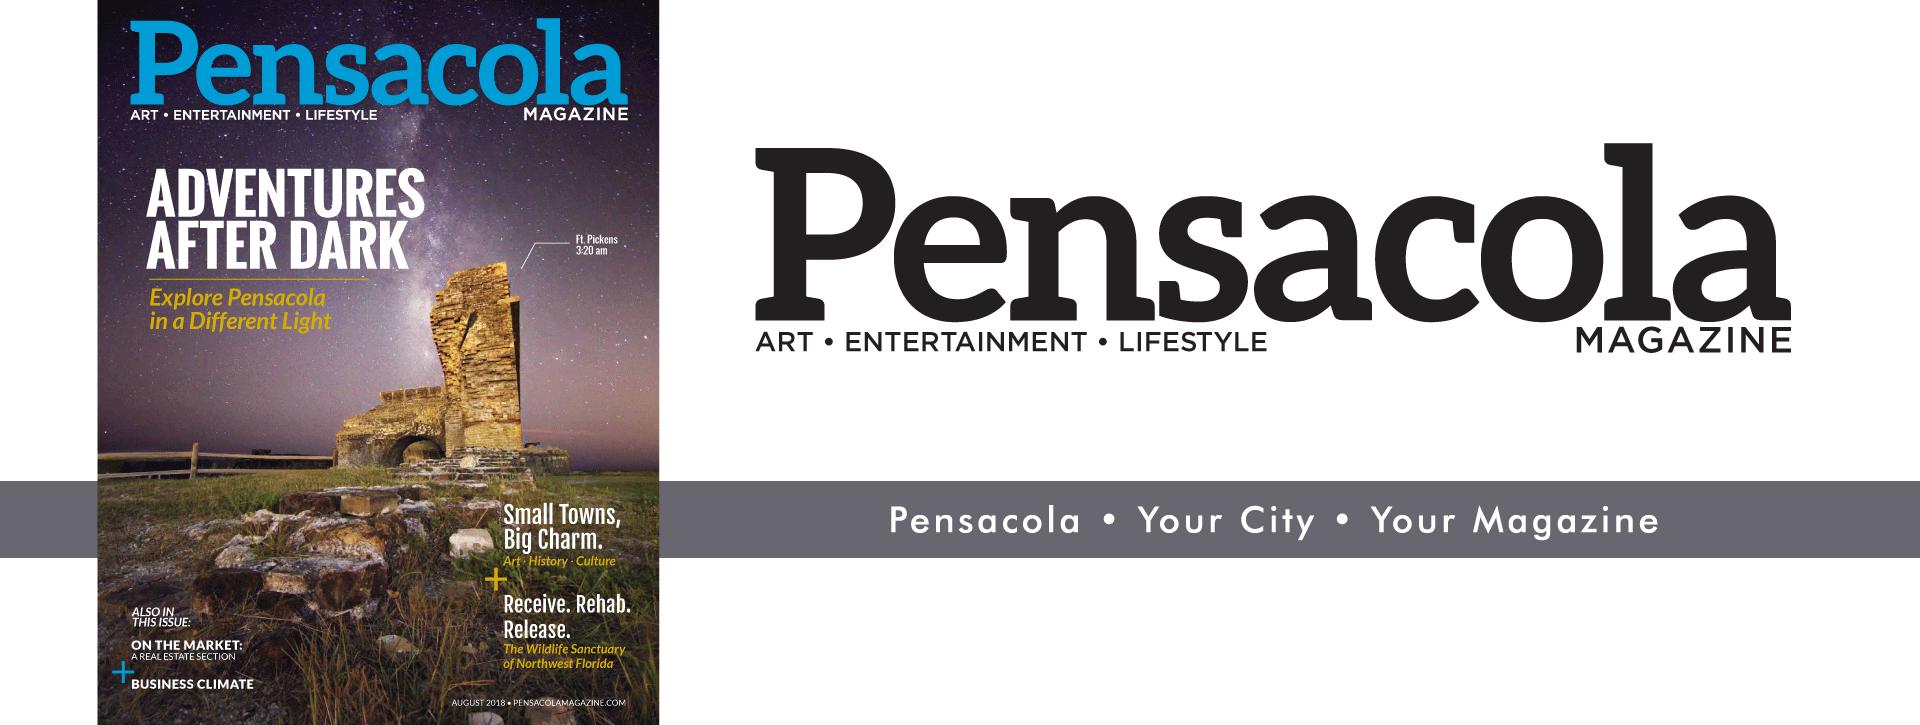 Pensacola Magazine, August 2018